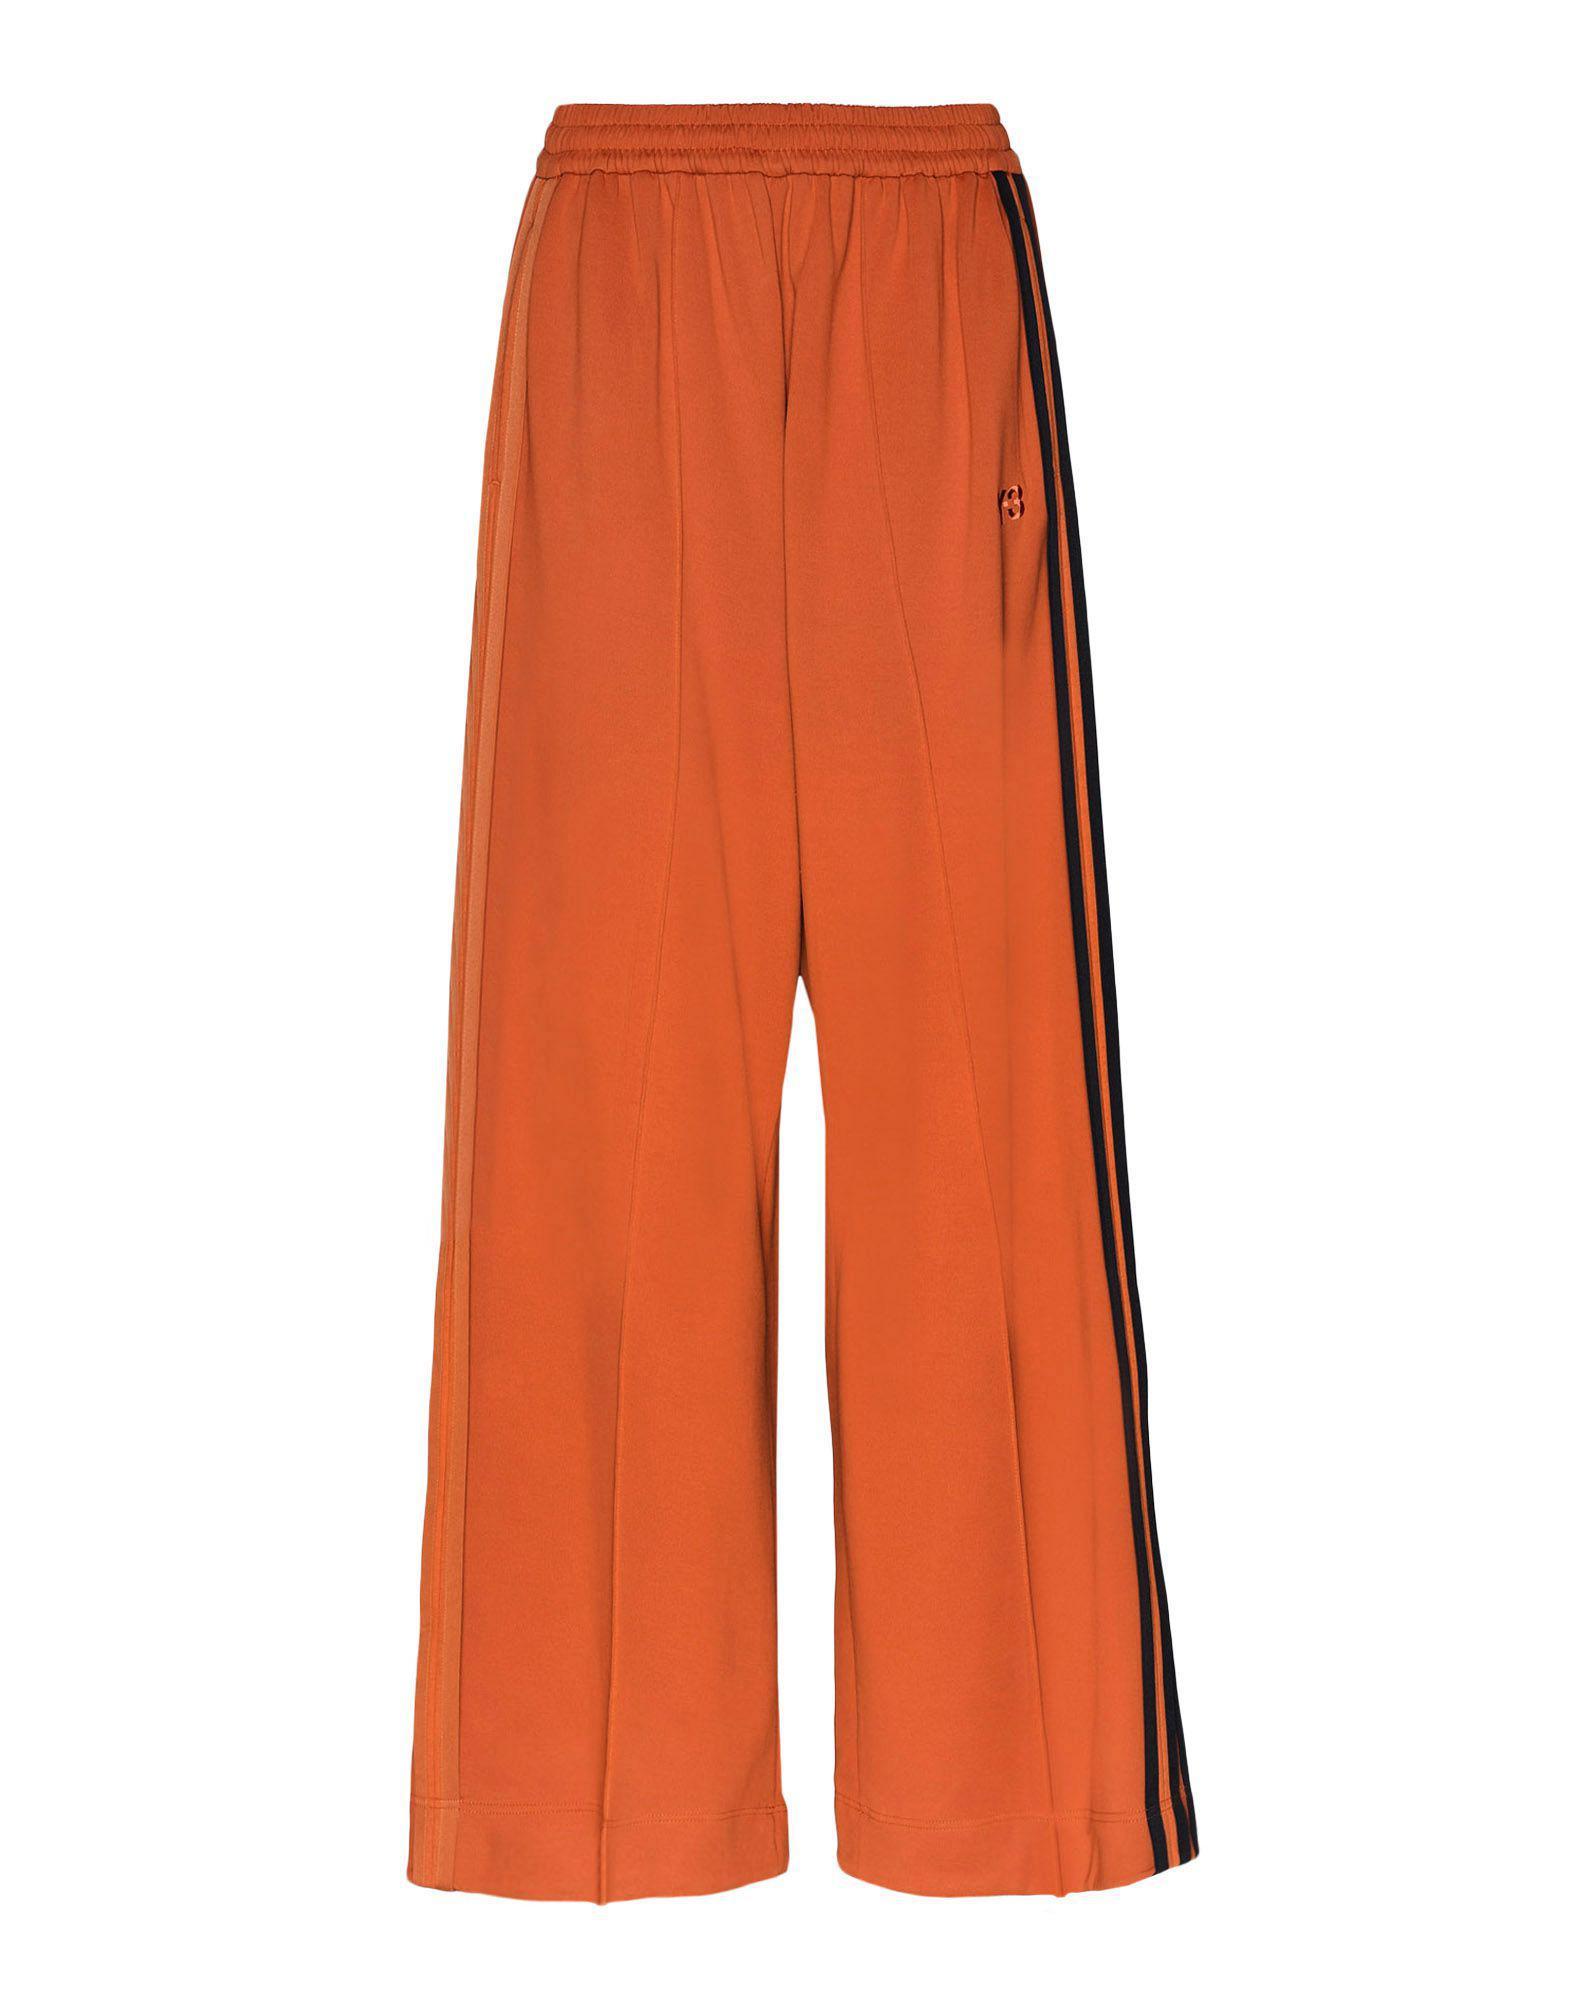 fc144fce04a41 Y-3. Women s 3-stripes Selvedge Matte Track Trousers